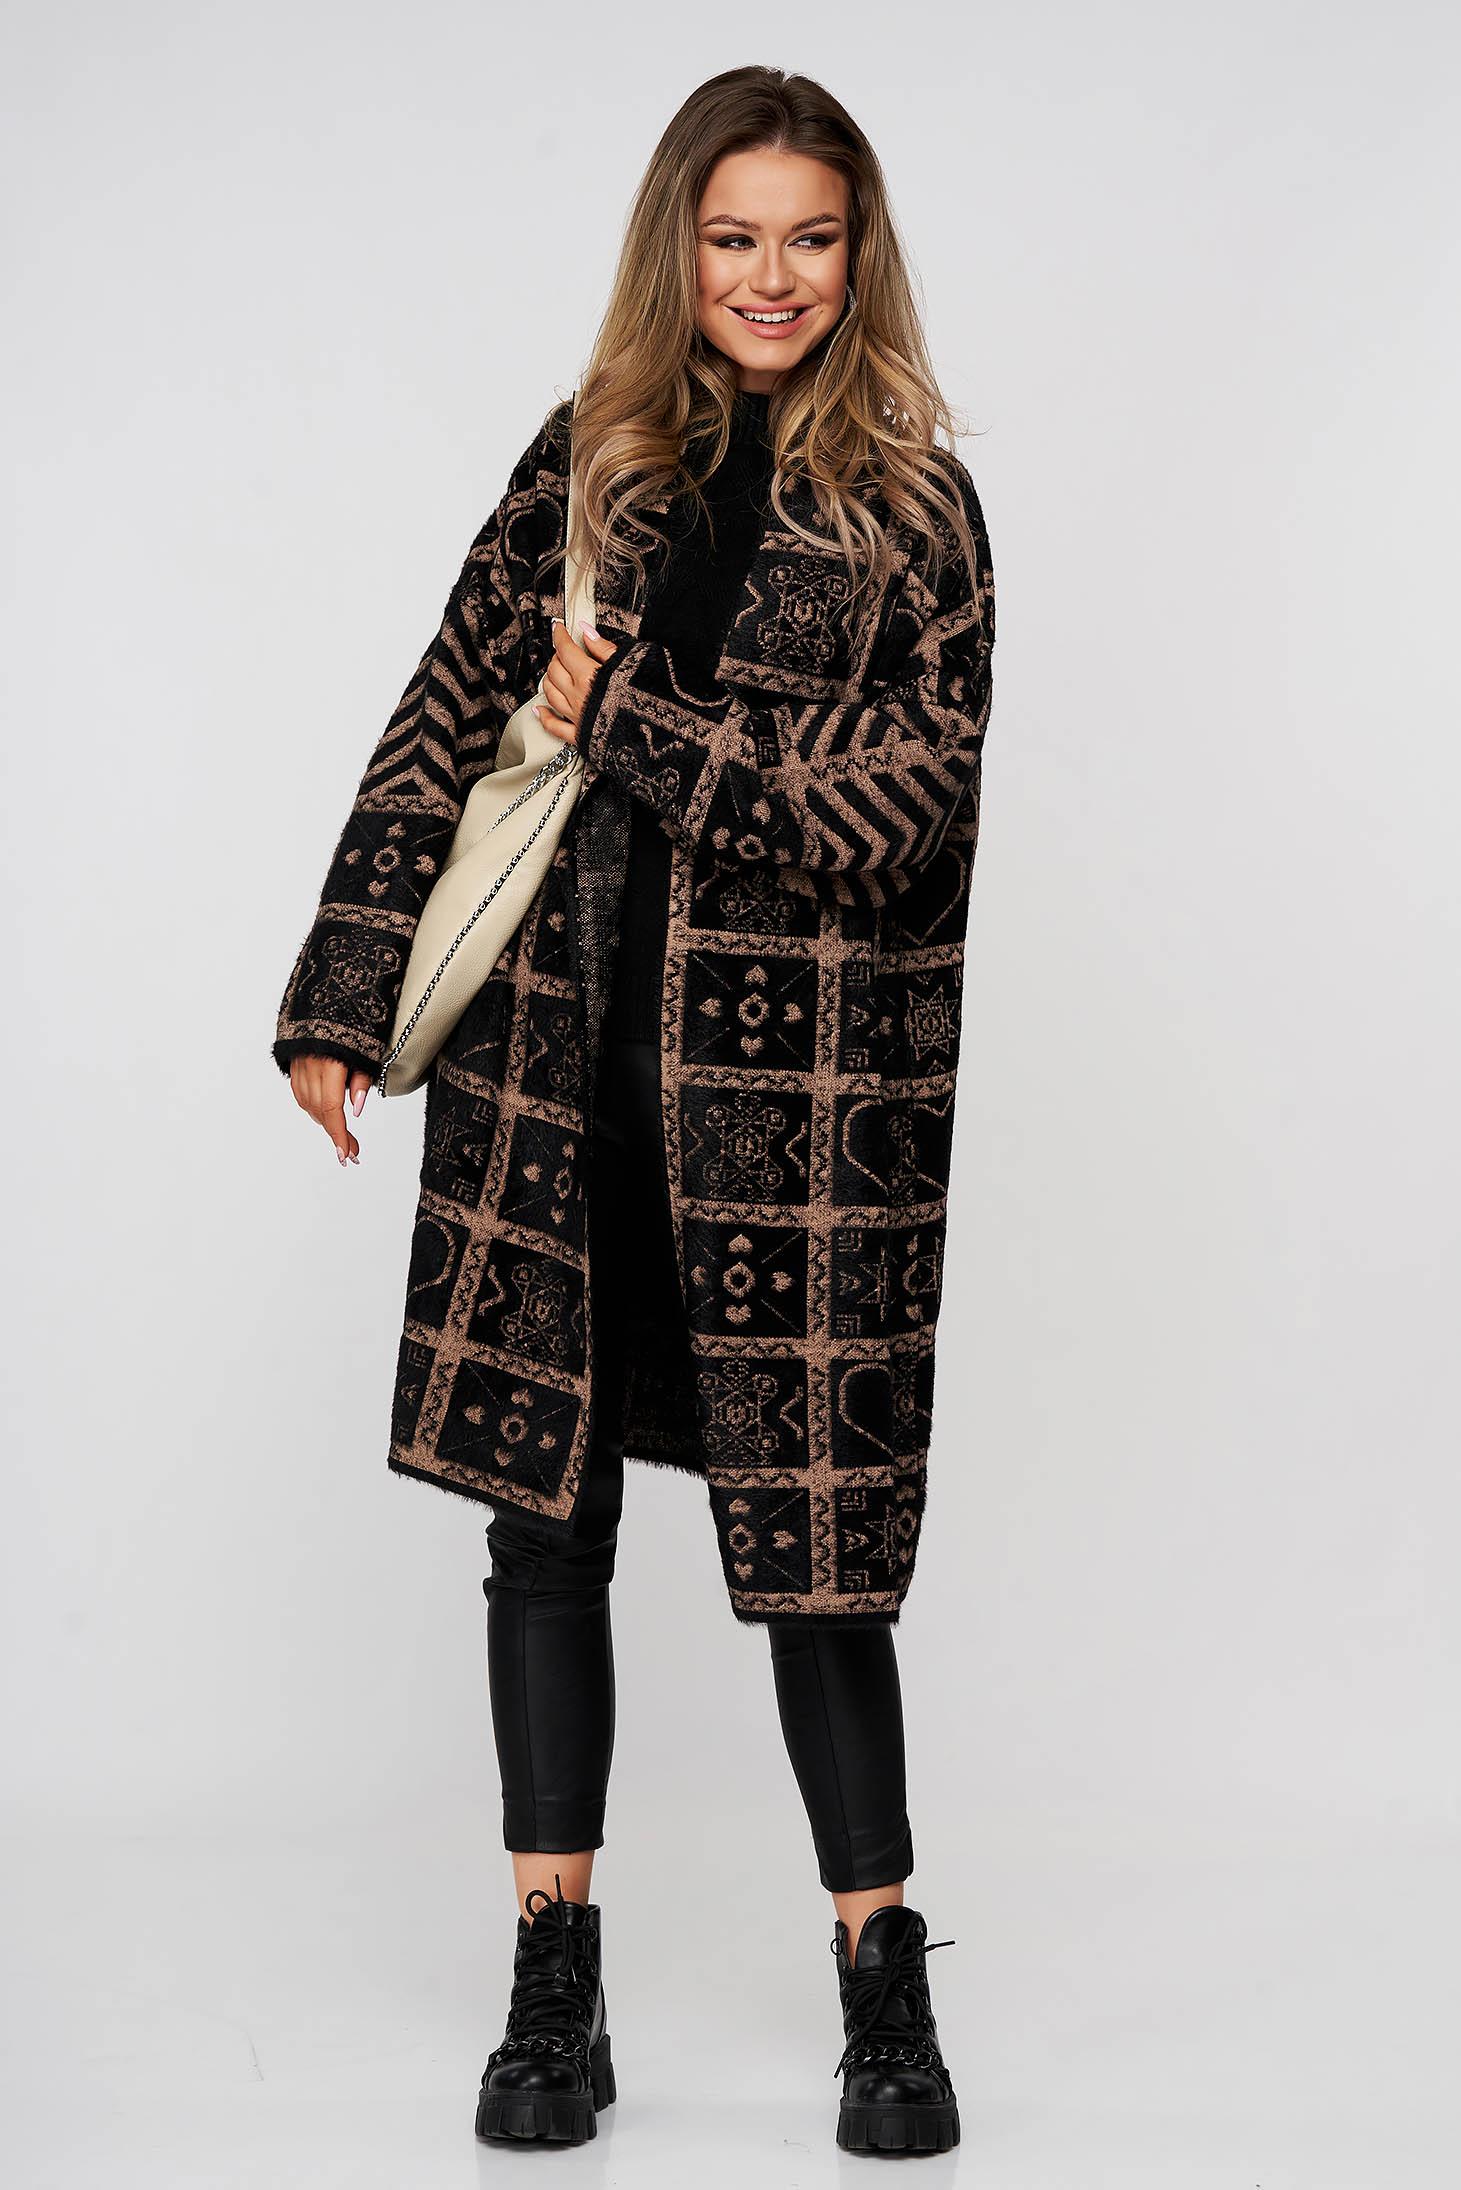 Pardesiu SunShine maro elegant lung din lana si angora cu croi larg